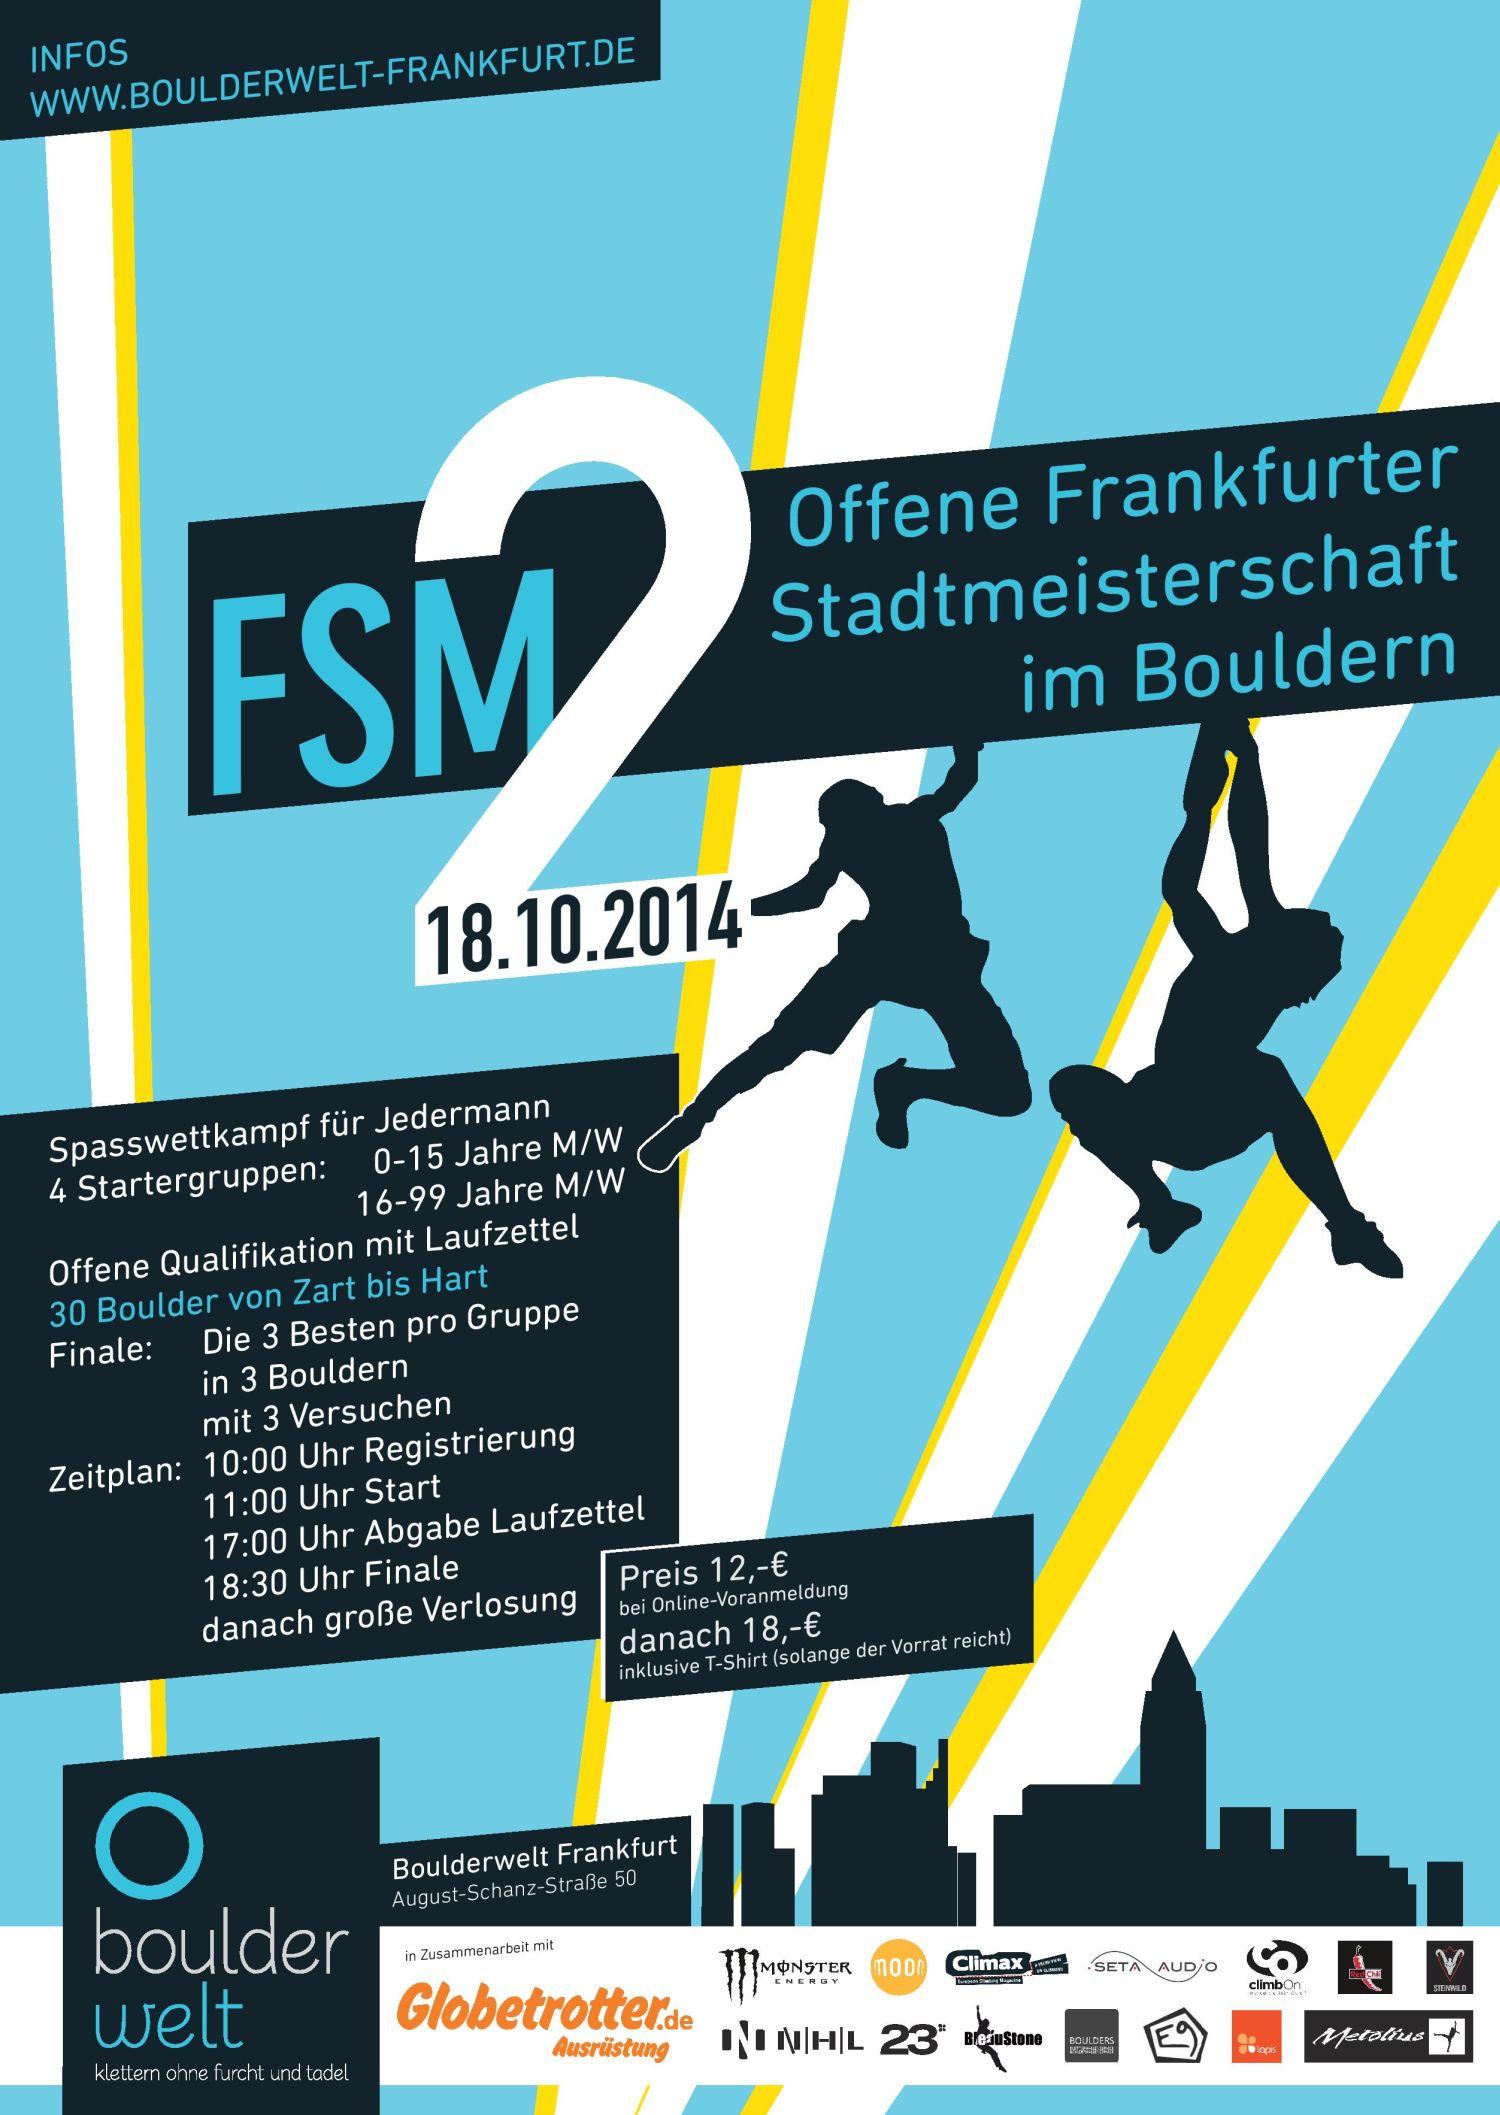 Frankfurter Stadtmeisterschaft im Bouldern - Fotocredit: Boulderwelt Frankfurt